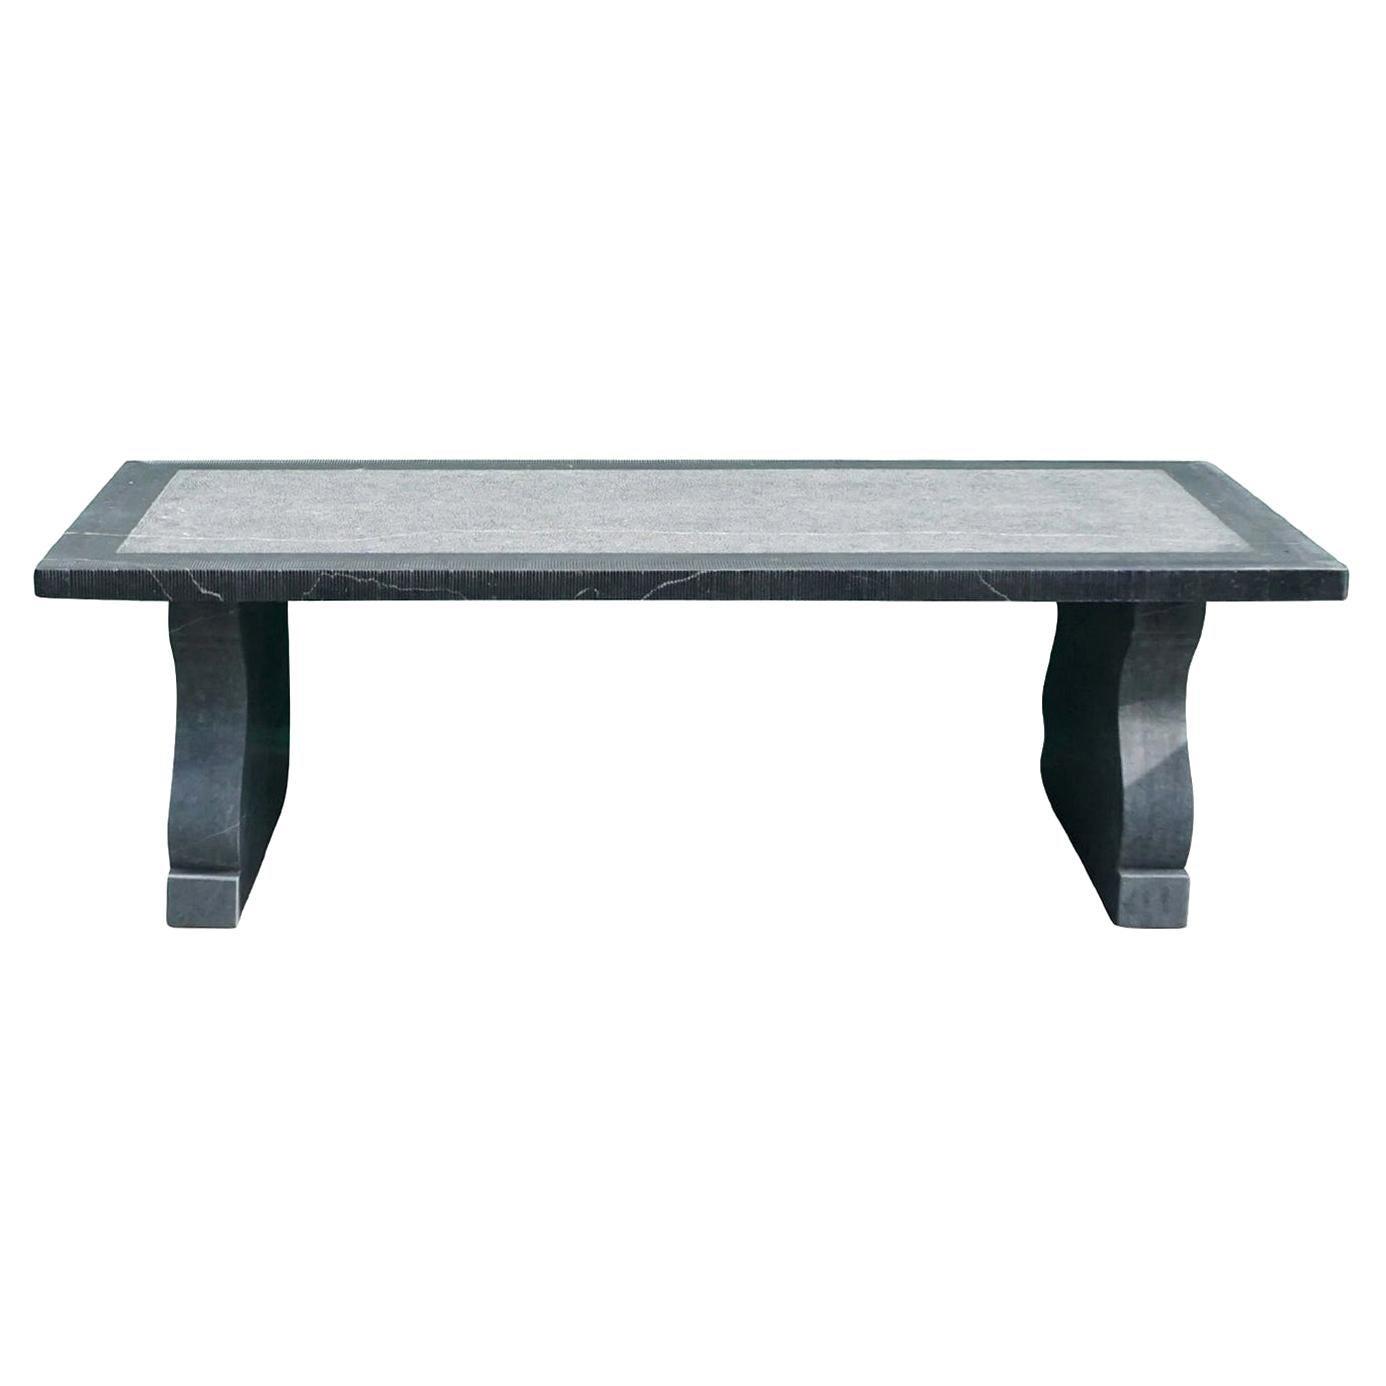 21st Century Belgian Grey Blue Stone Rectangular Dining Table